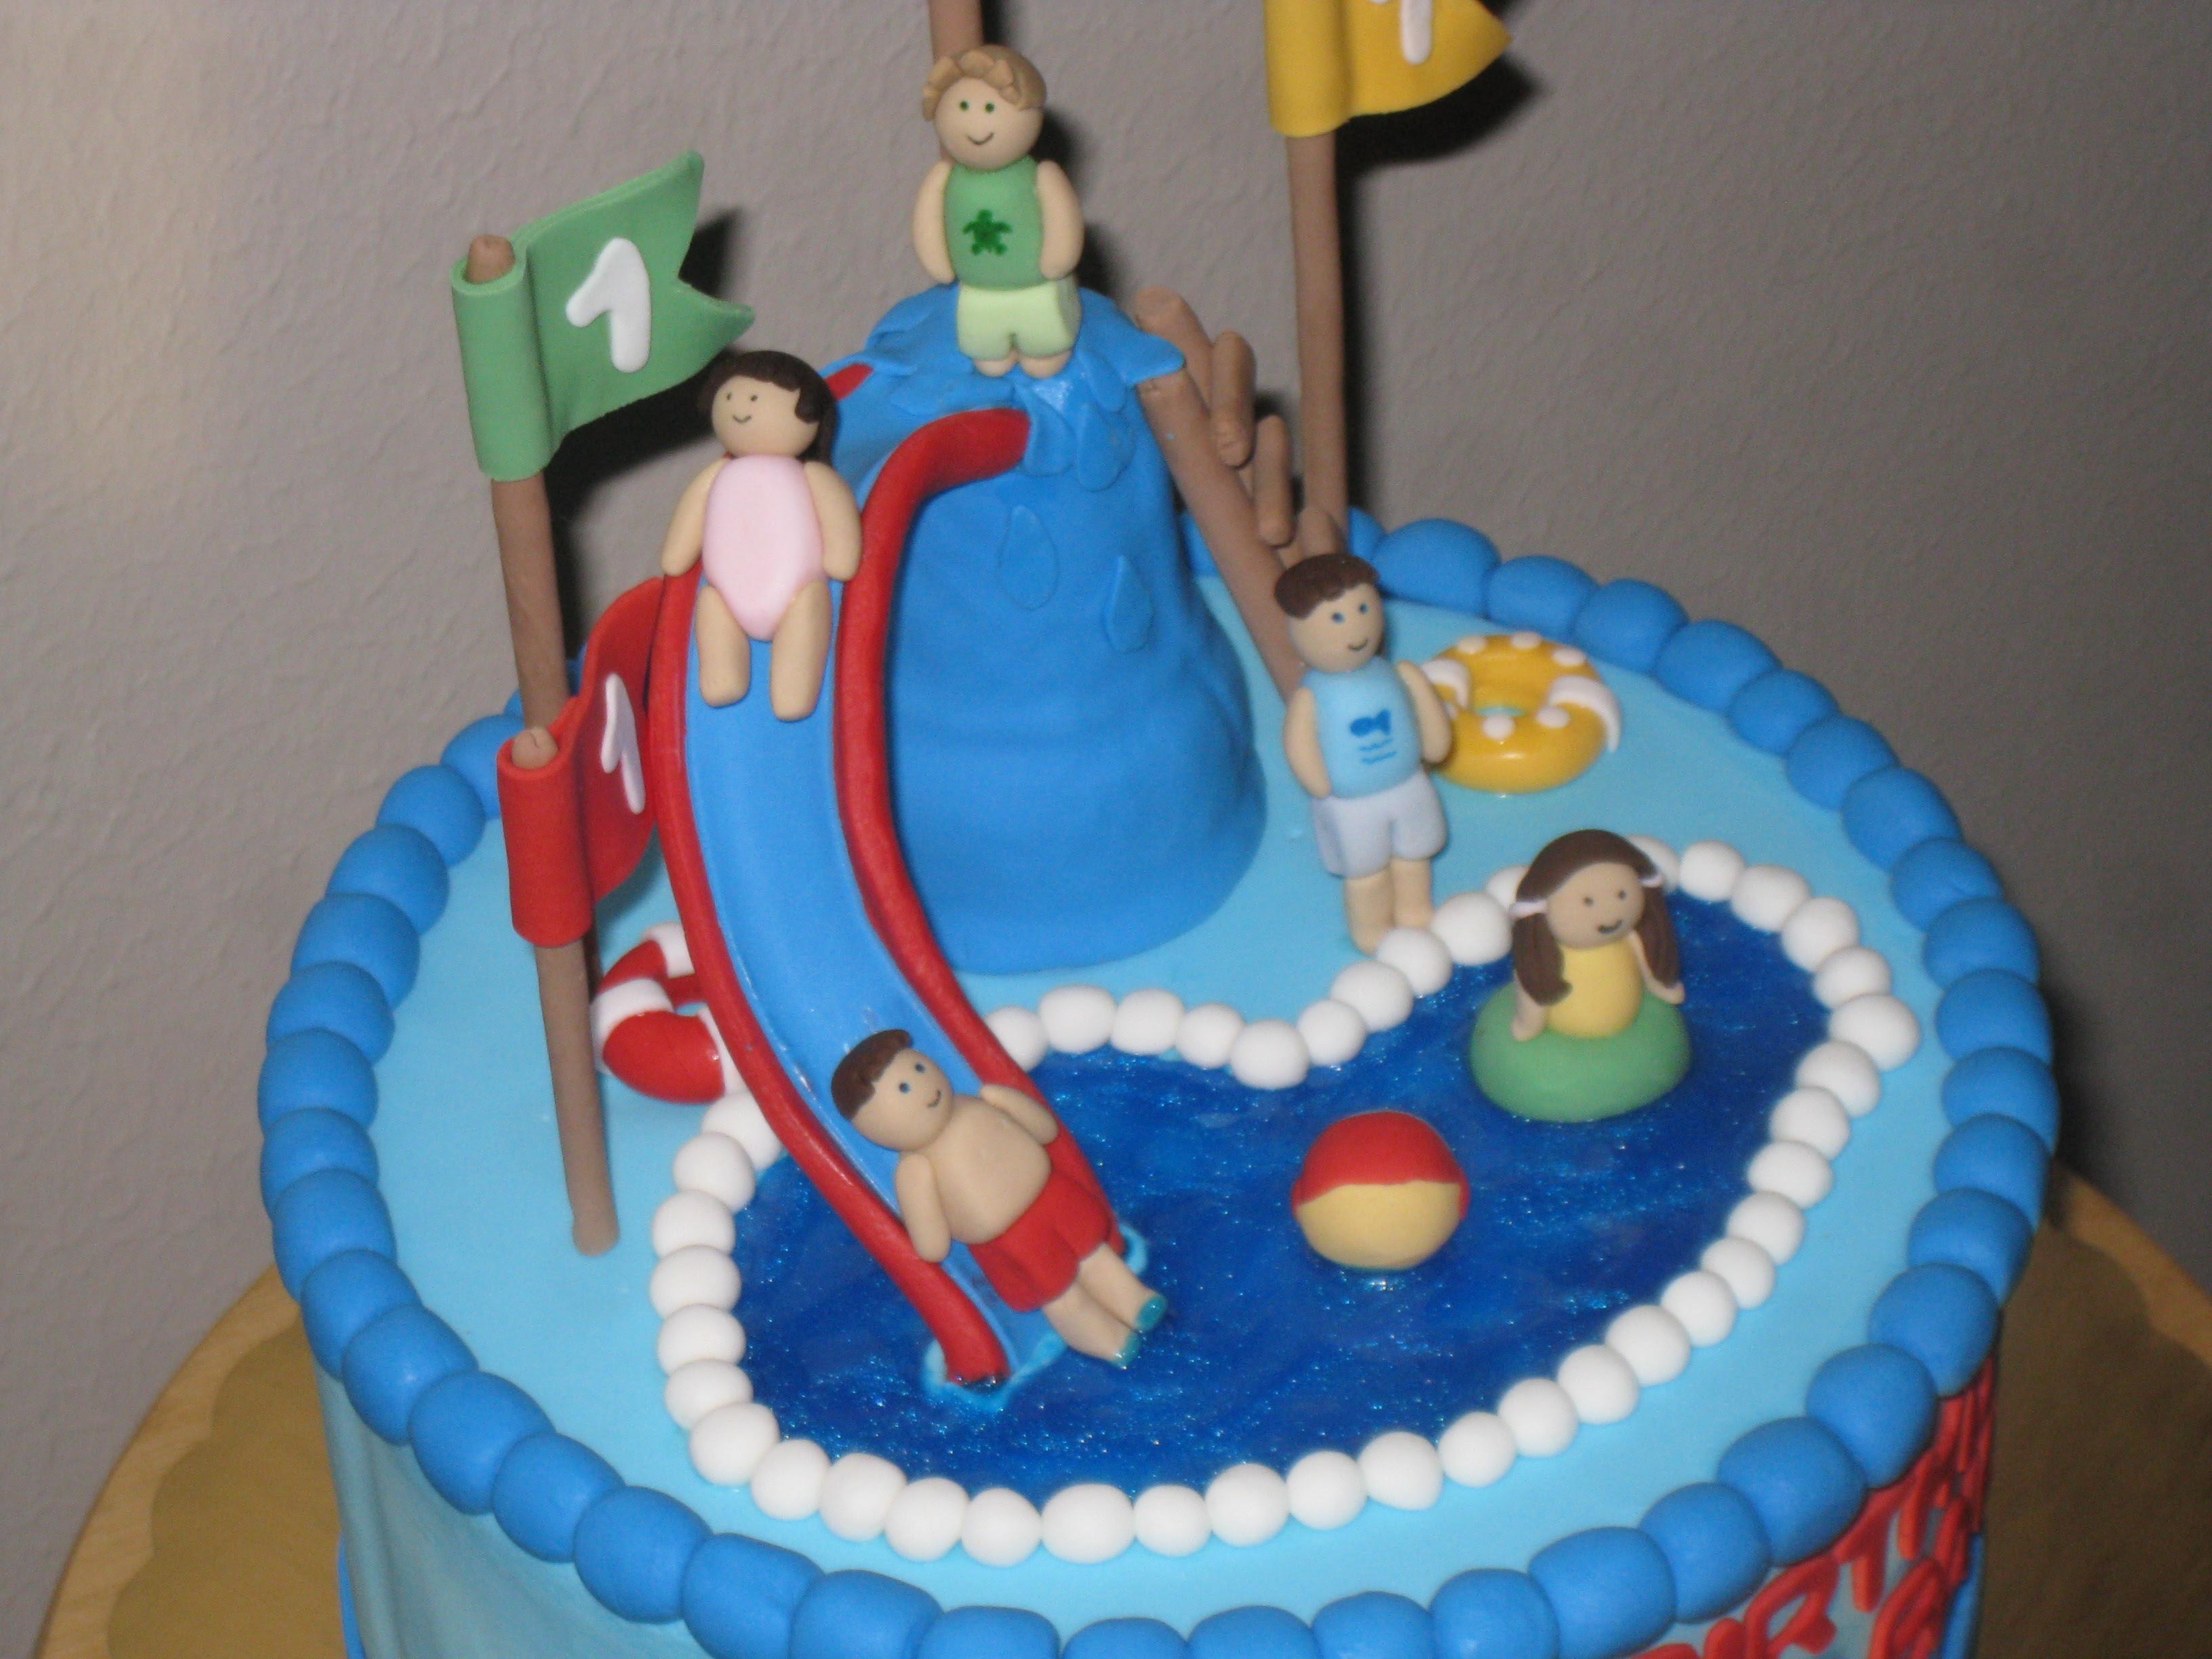 cake | The Sugar Scene